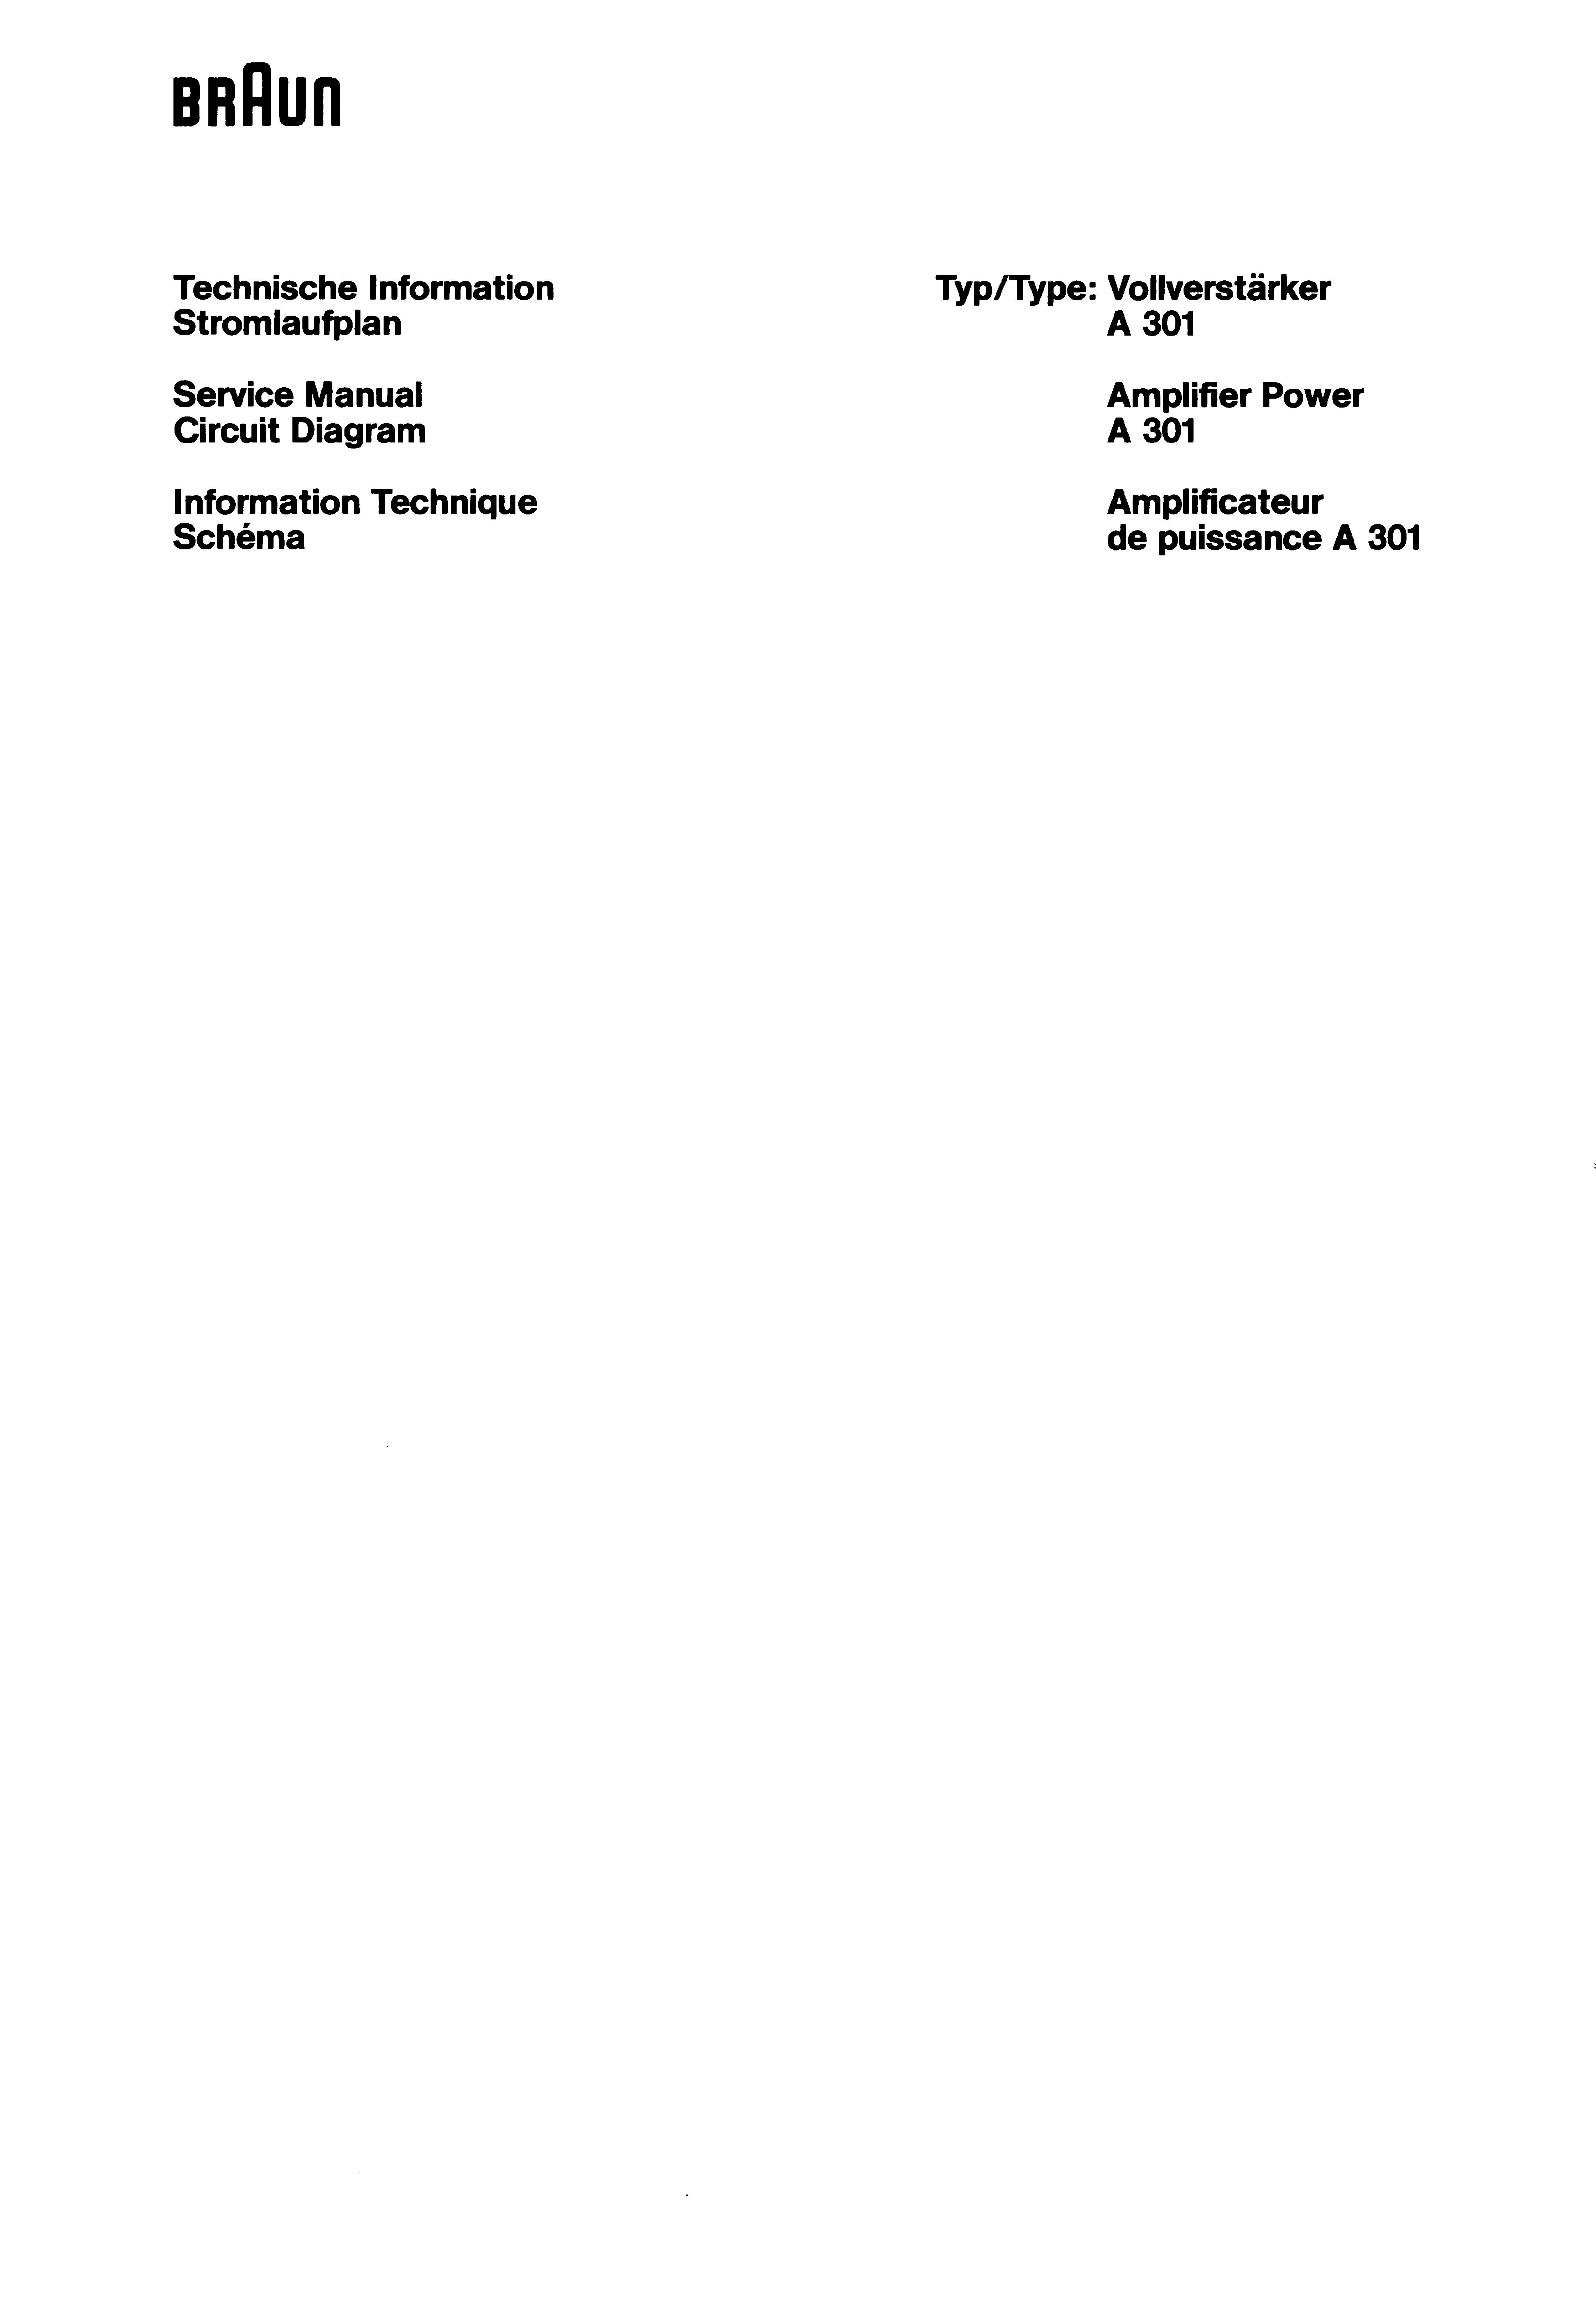 Braun ps500 service manual immediate download.